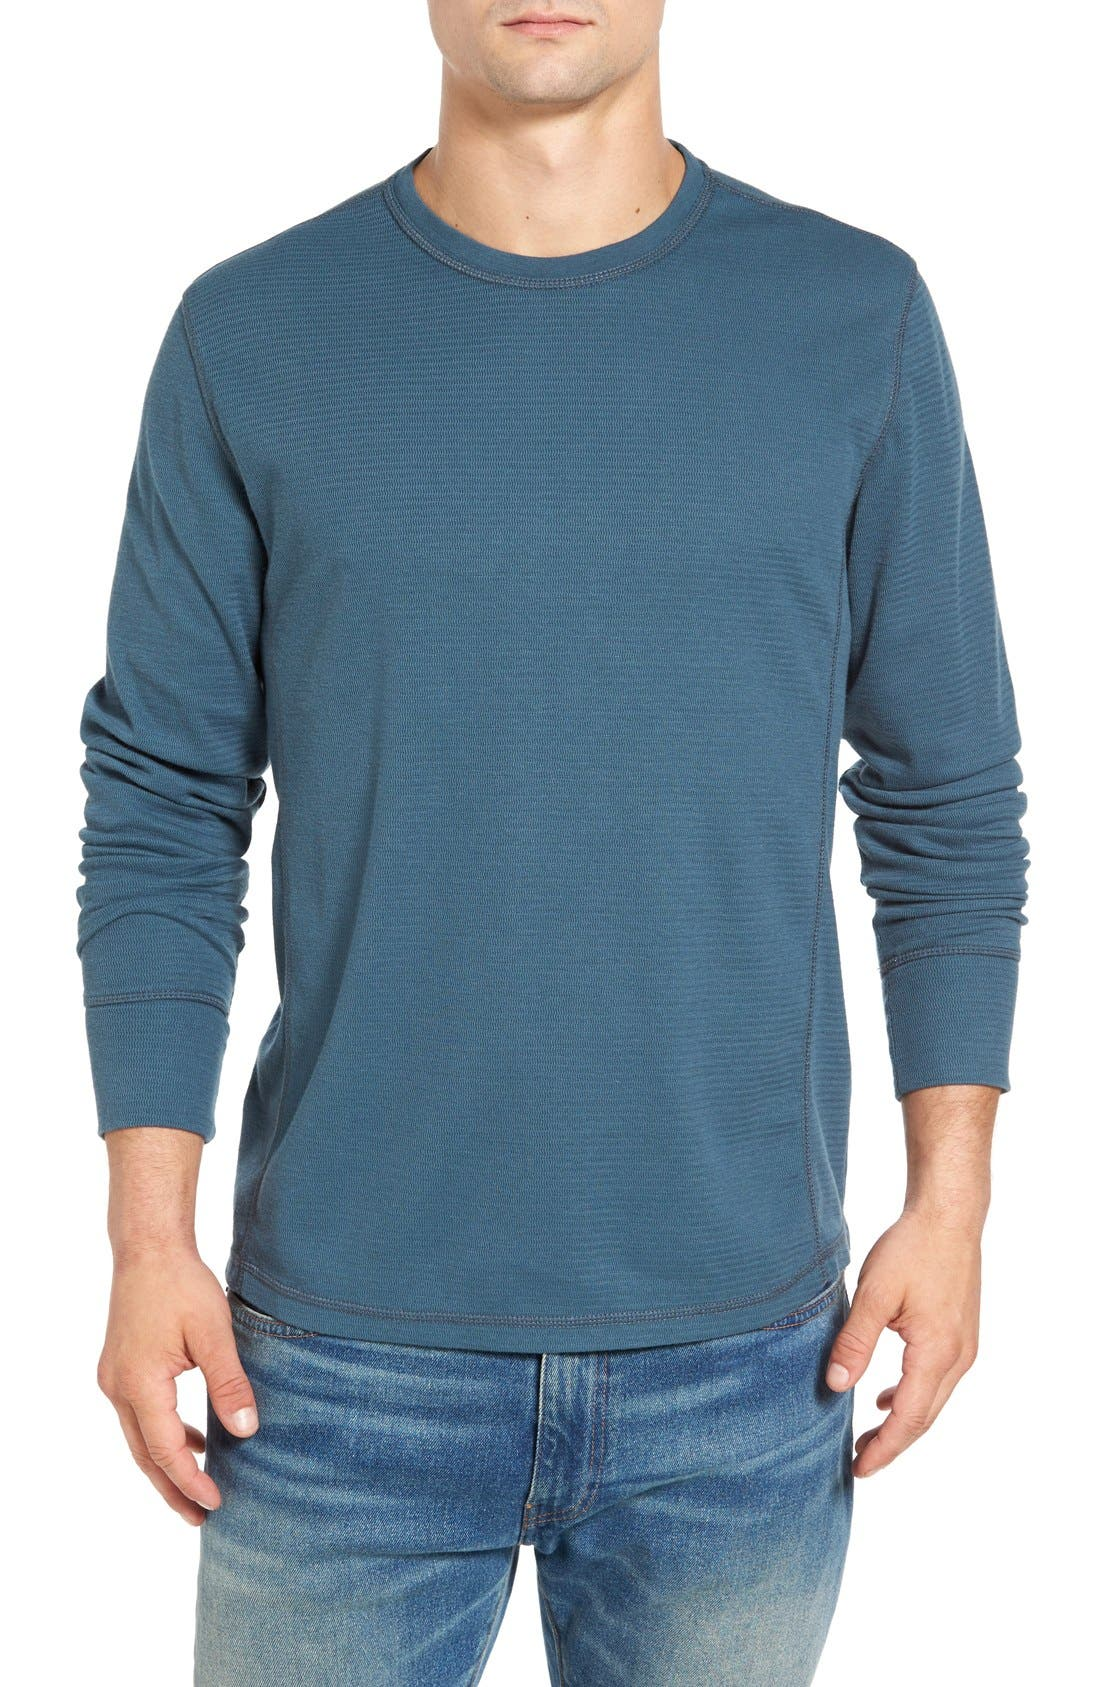 Alternate Image 1 Selected - Jeremiah Larsen Zigzag Thermal T-Shirt